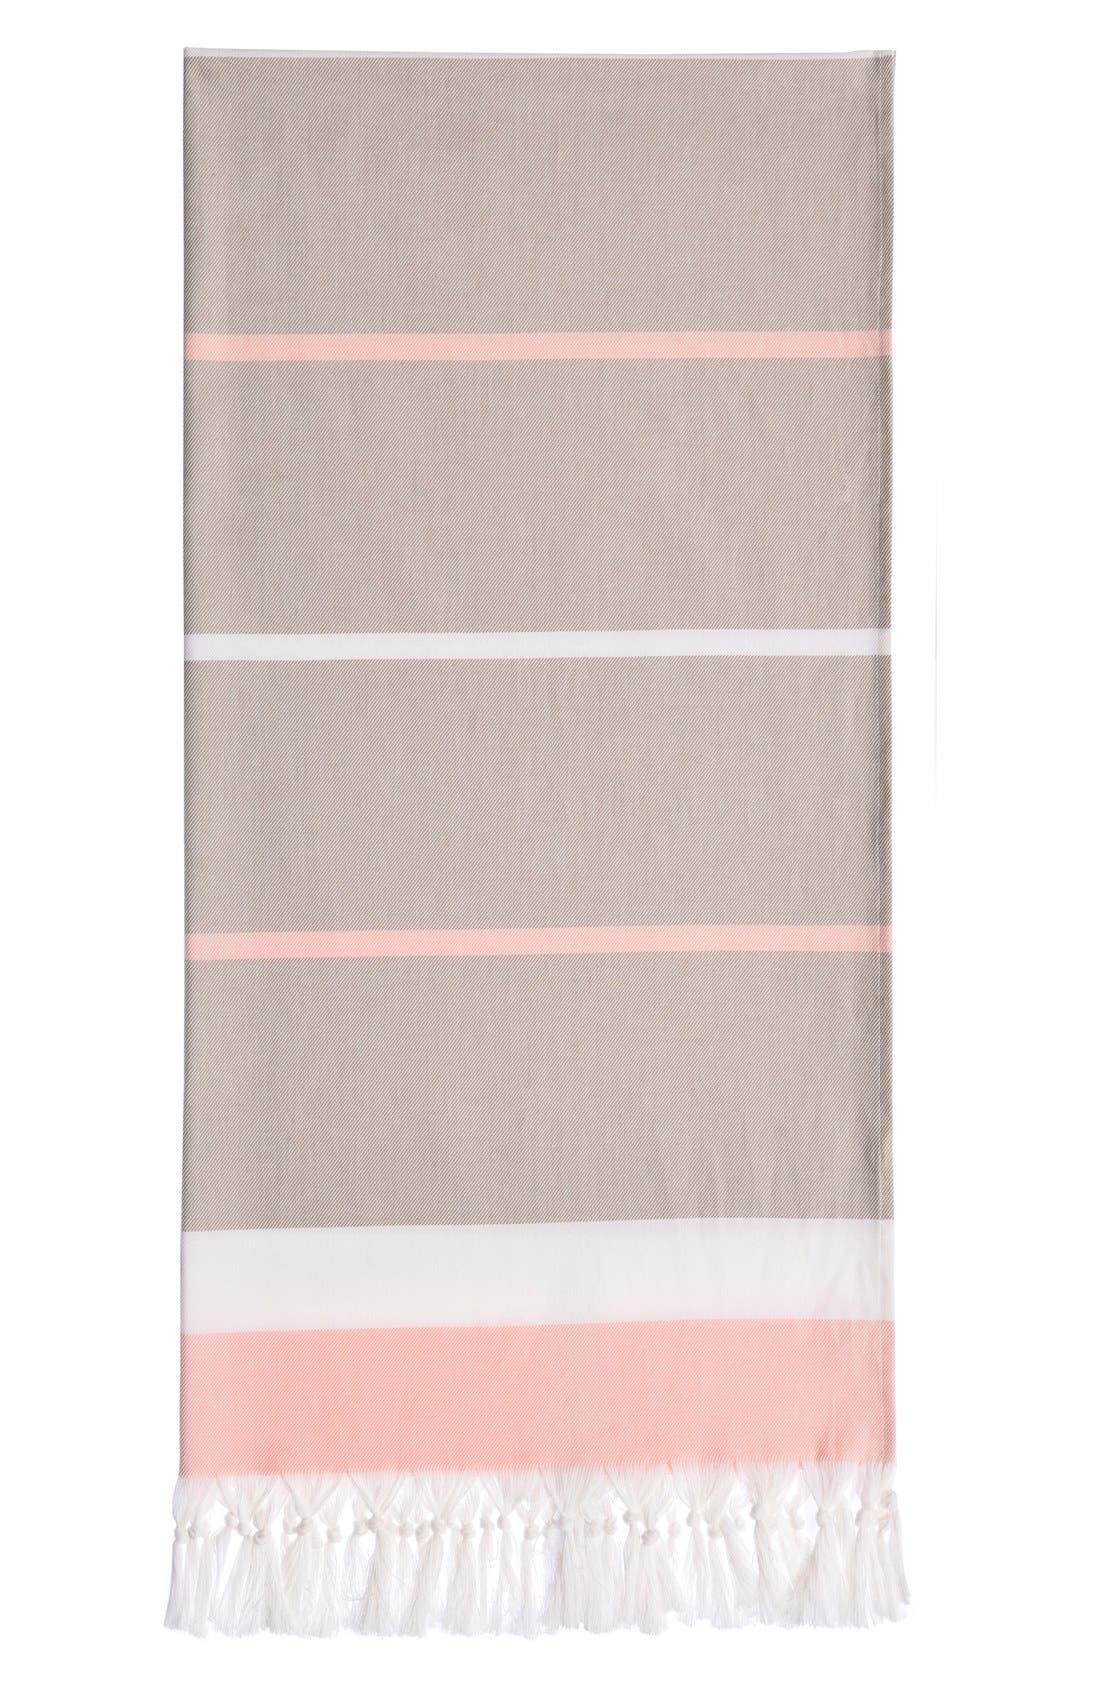 Alternate Image 1 Selected - Linum Home Textiles 'Seaside Fun' Turkish Pestemal Towel